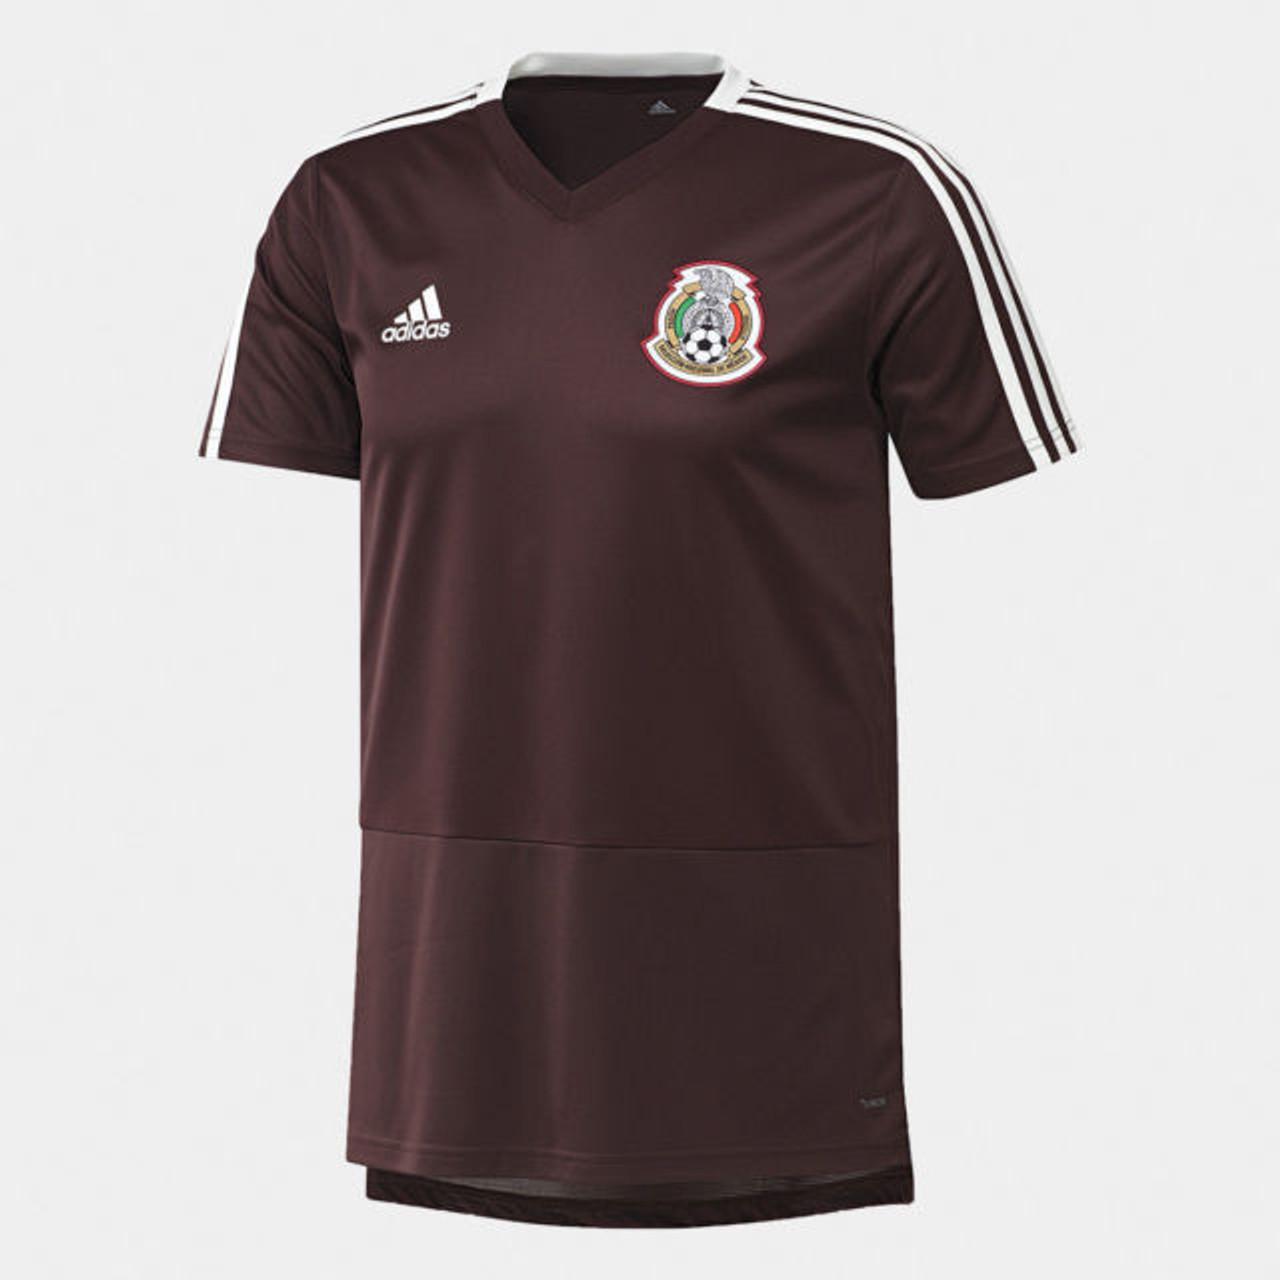 ADIDAS MEXICO 2018 TRAINING JERSEY